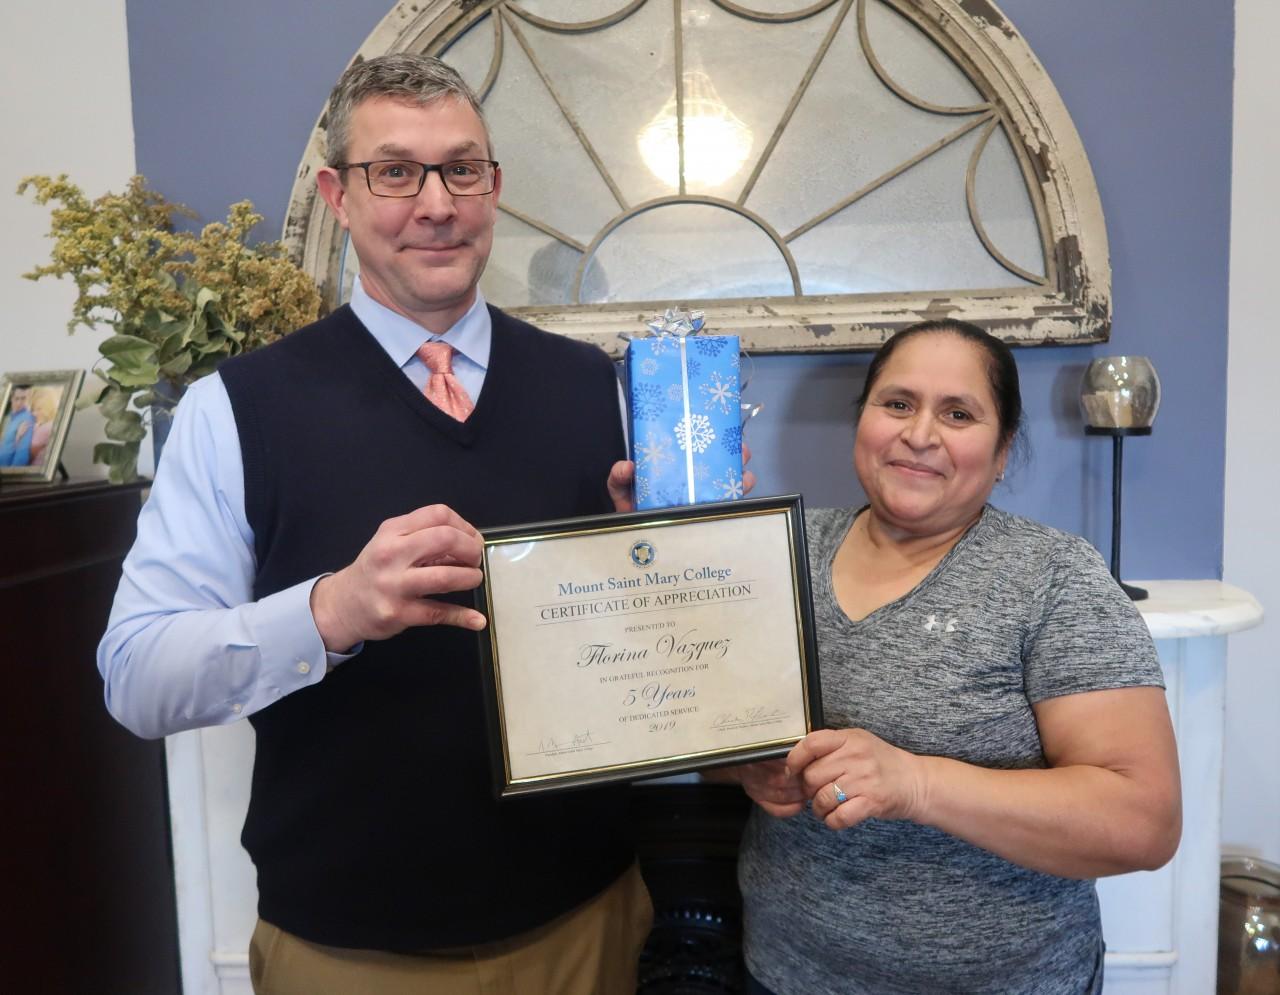 Florina Vazquez (Facilities) and Dr. Jason Adsit, president of the Mount